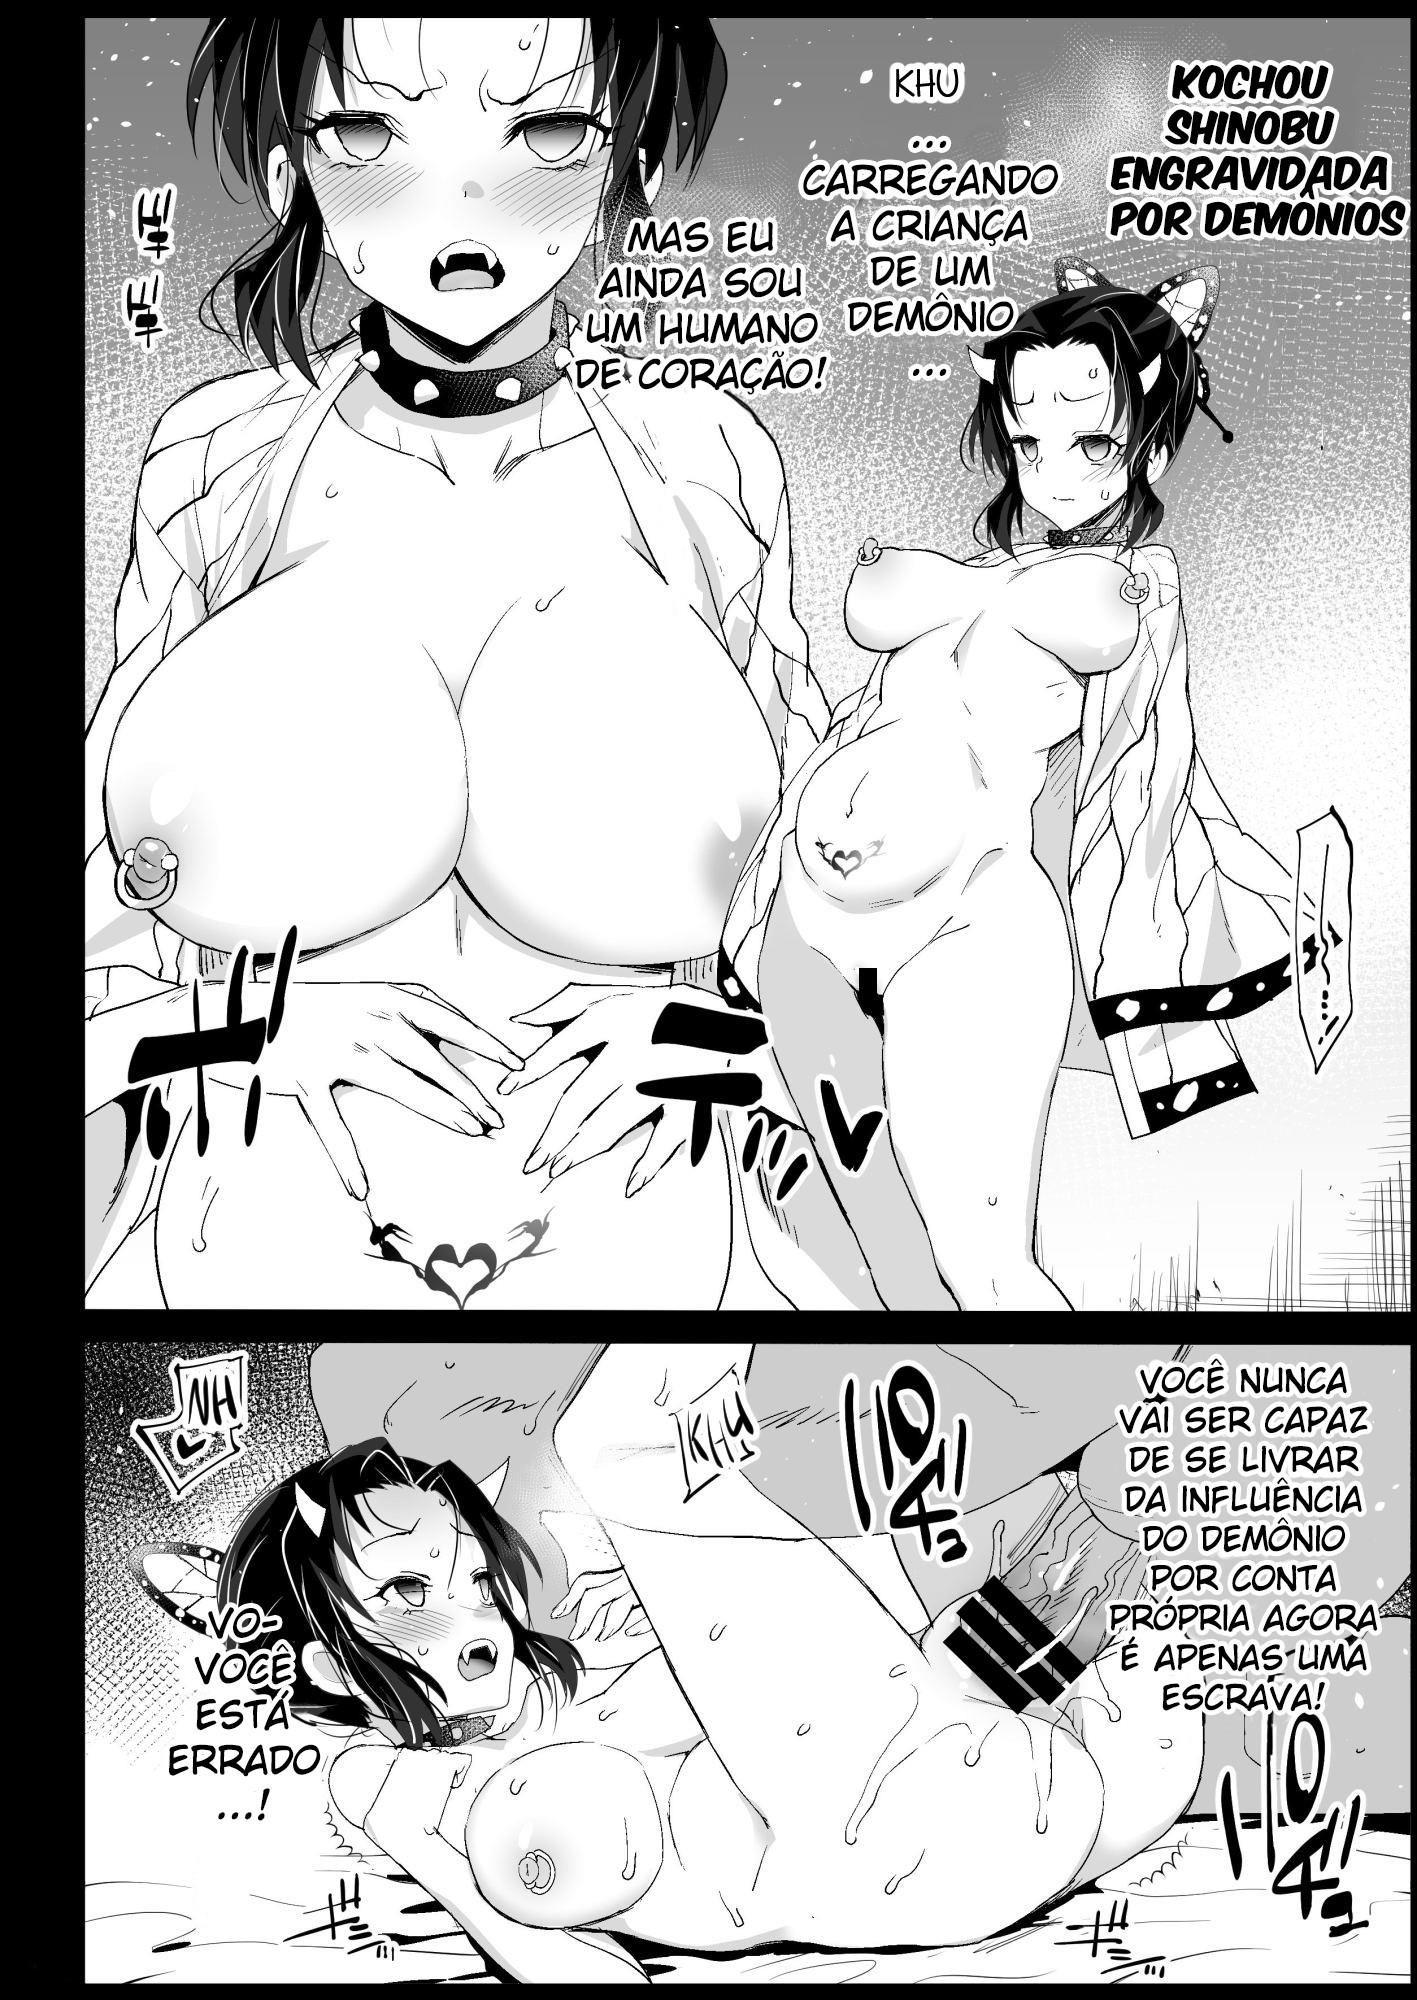 Estupro da caçadora de demônios